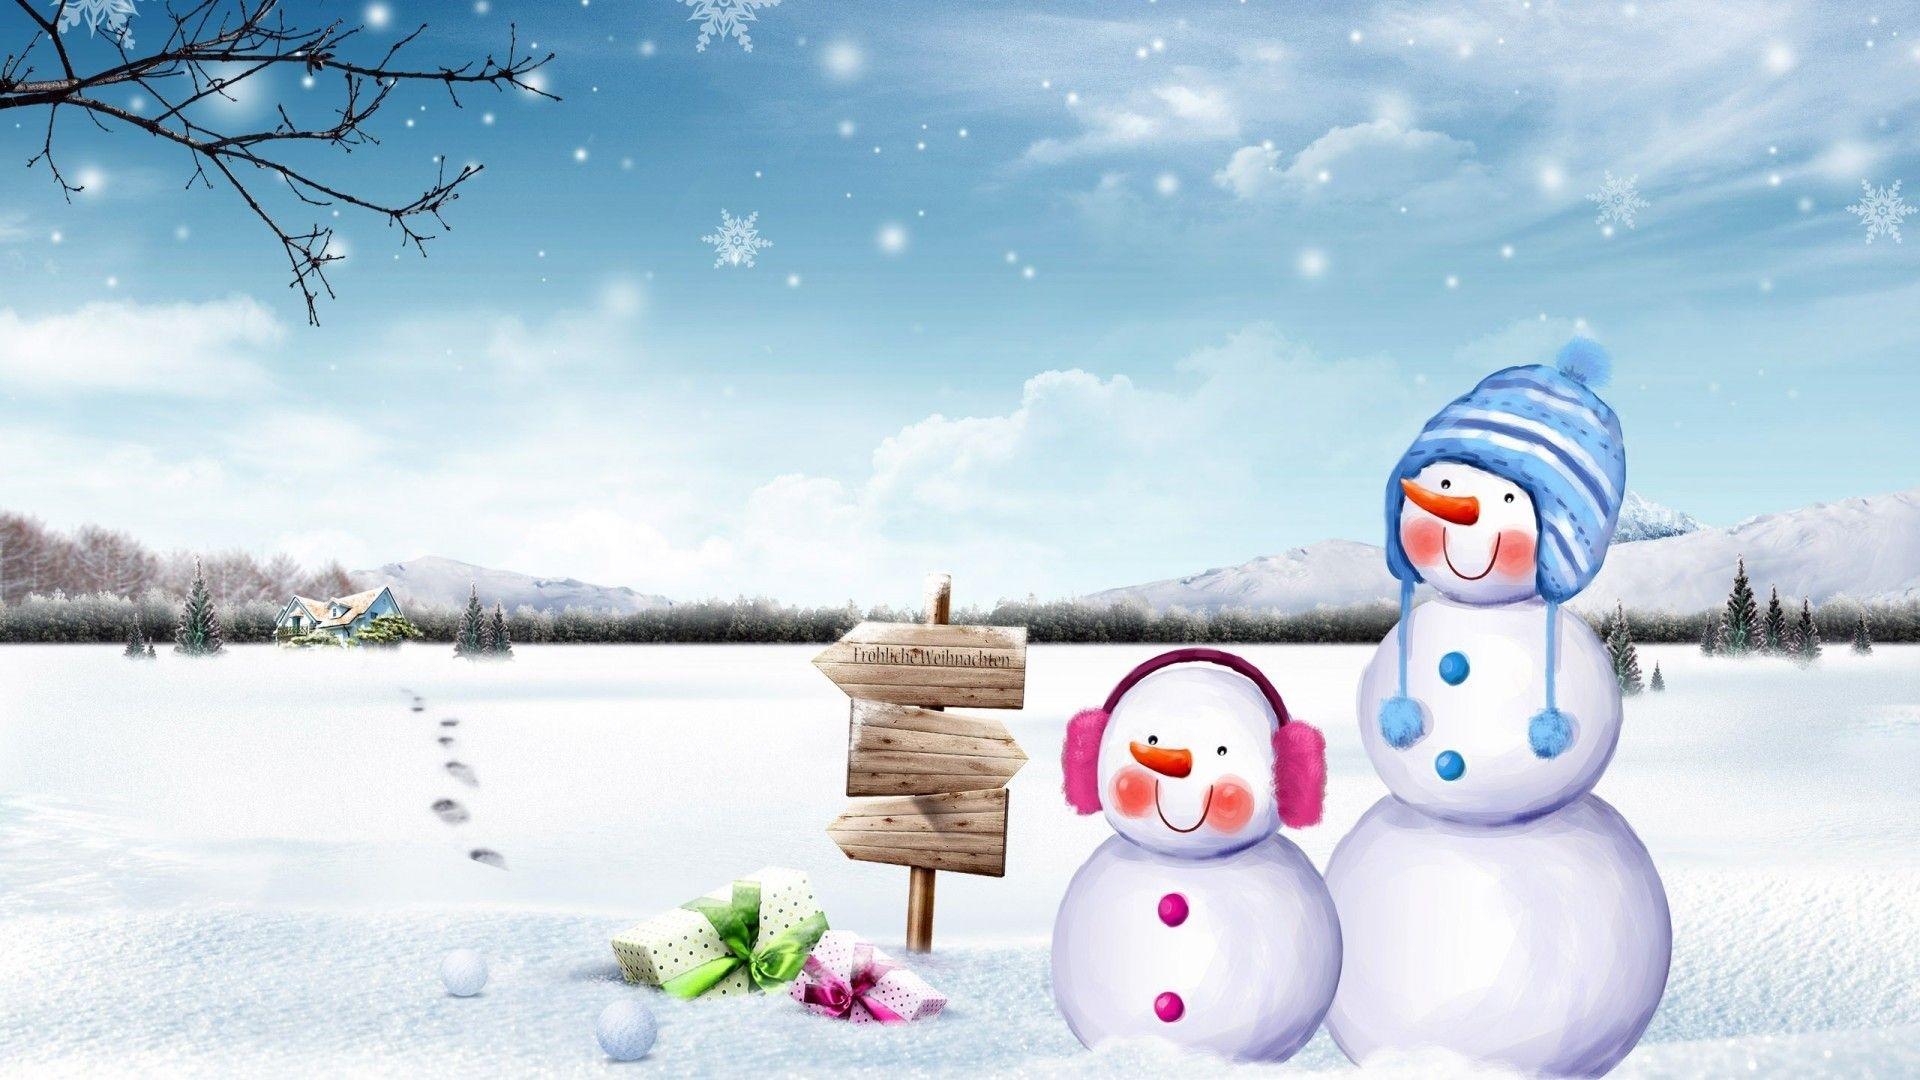 Snowman Wallpaper Picture hd